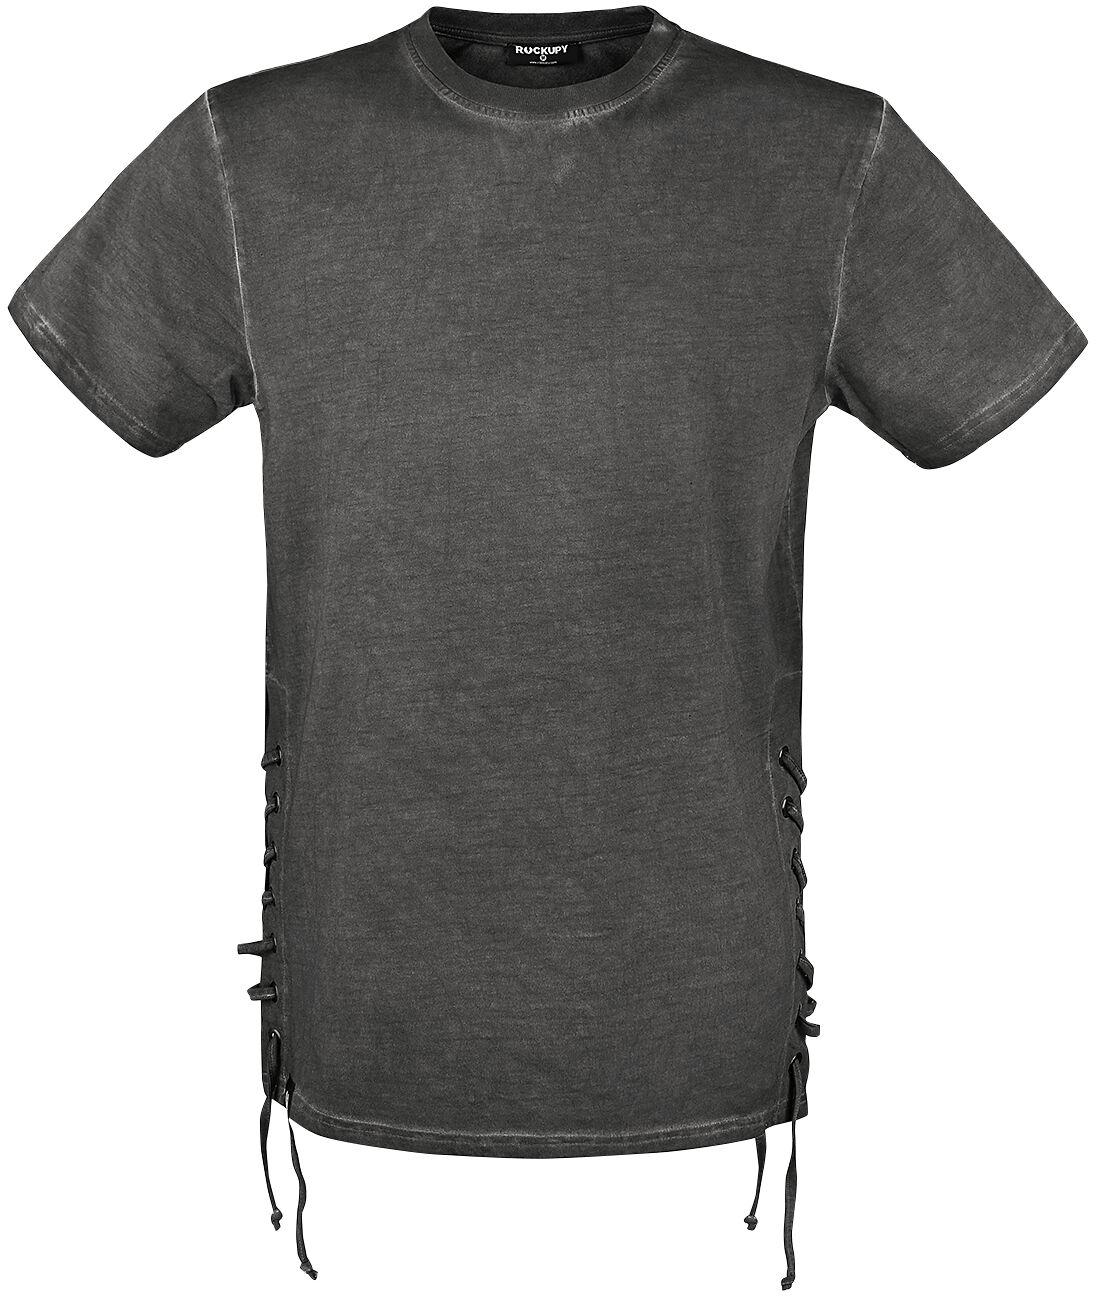 Marki - Koszulki - T-Shirt Rockupy Side Laced Oil Washed T-Shirt T-Shirt ciemnoszary (Anthracite) - 353764